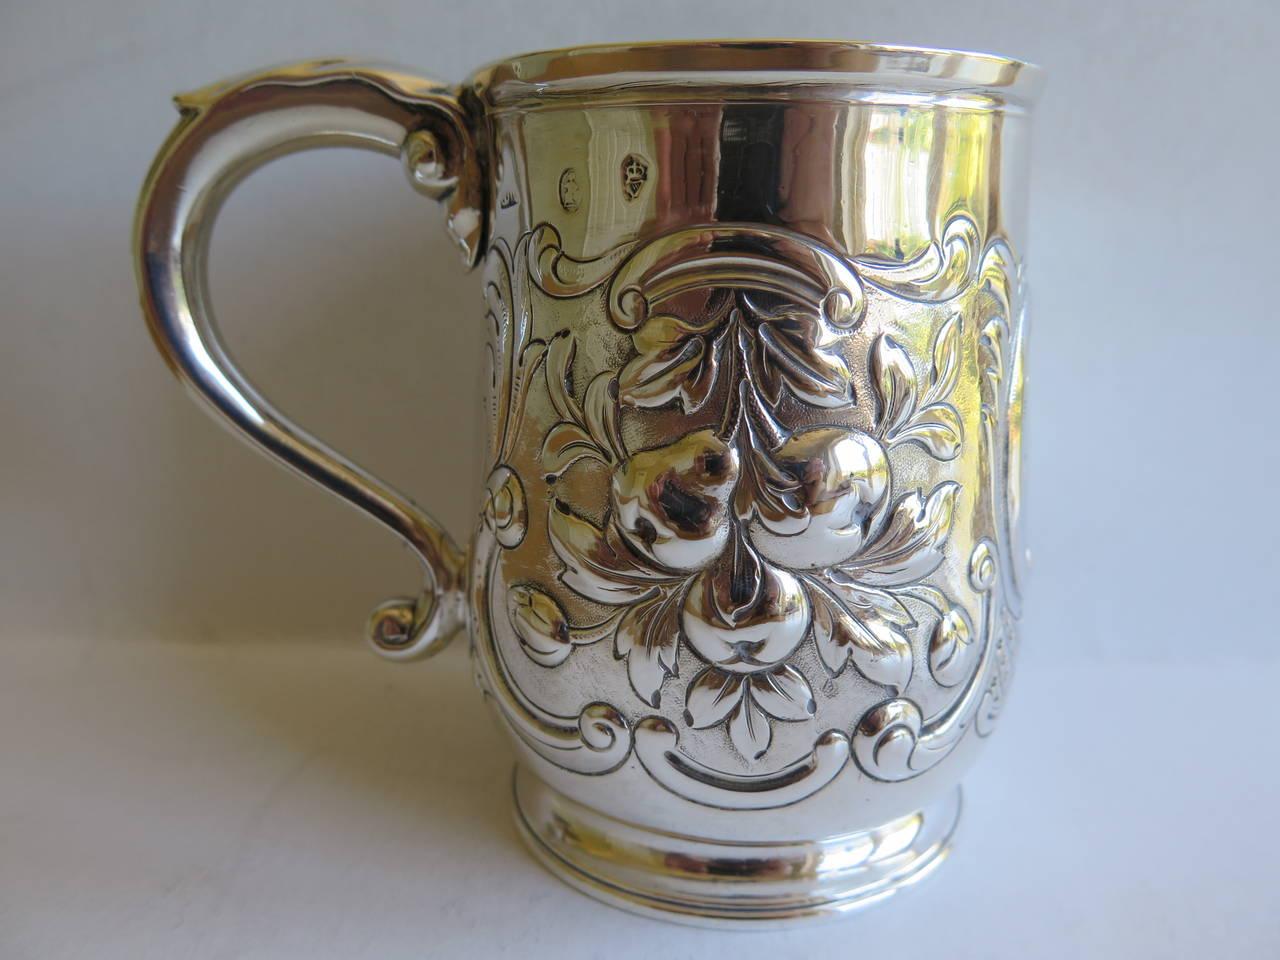 Rare Irish George II Silver Mug or Tankard by John Moore, Dublin 1740 2